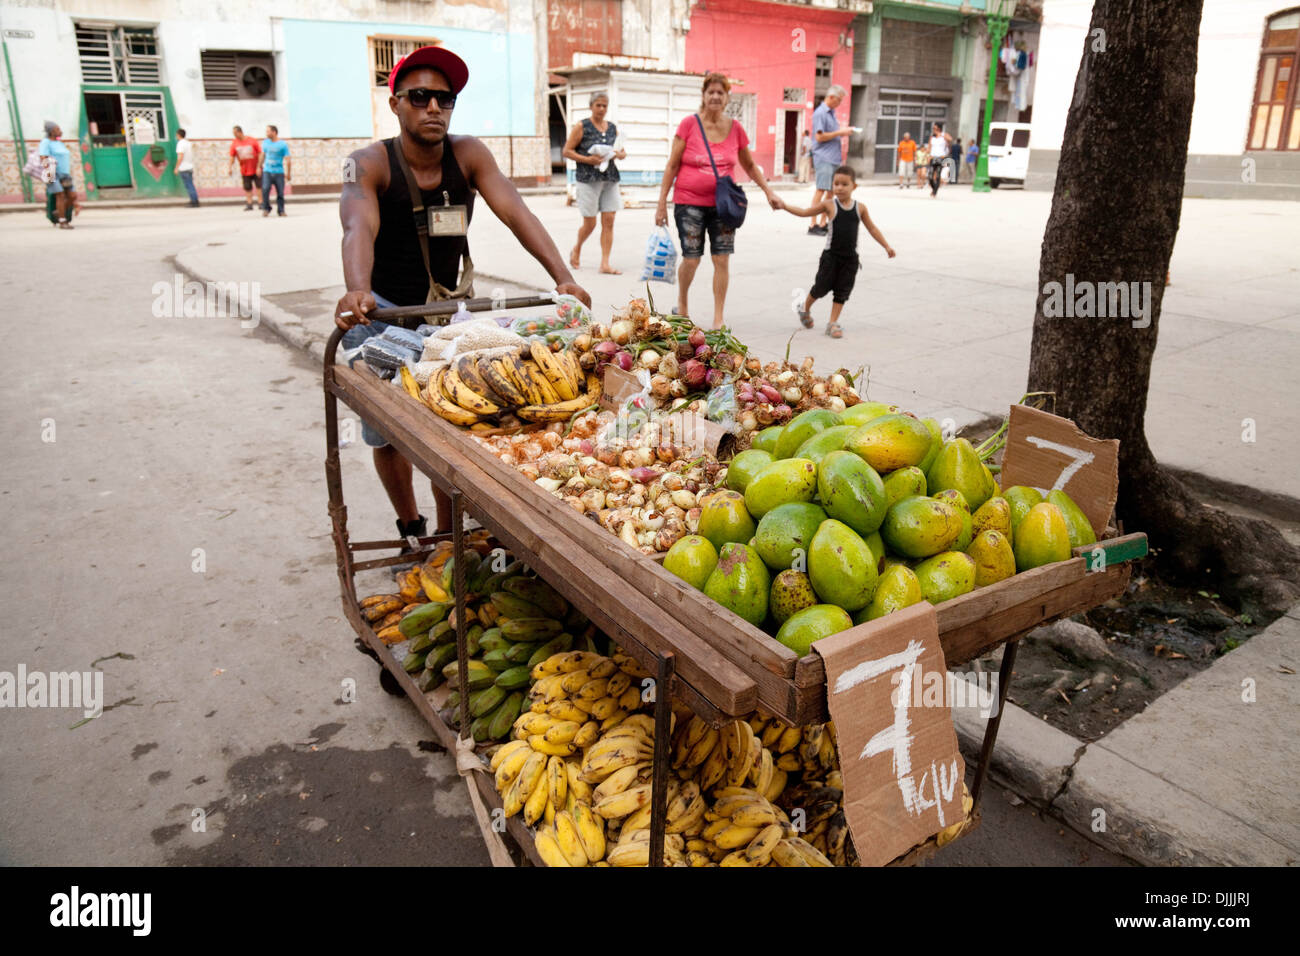 A stallkeeper and his fruit stall, Brasil St, Havana, Cuba, Caribbean - Stock Image